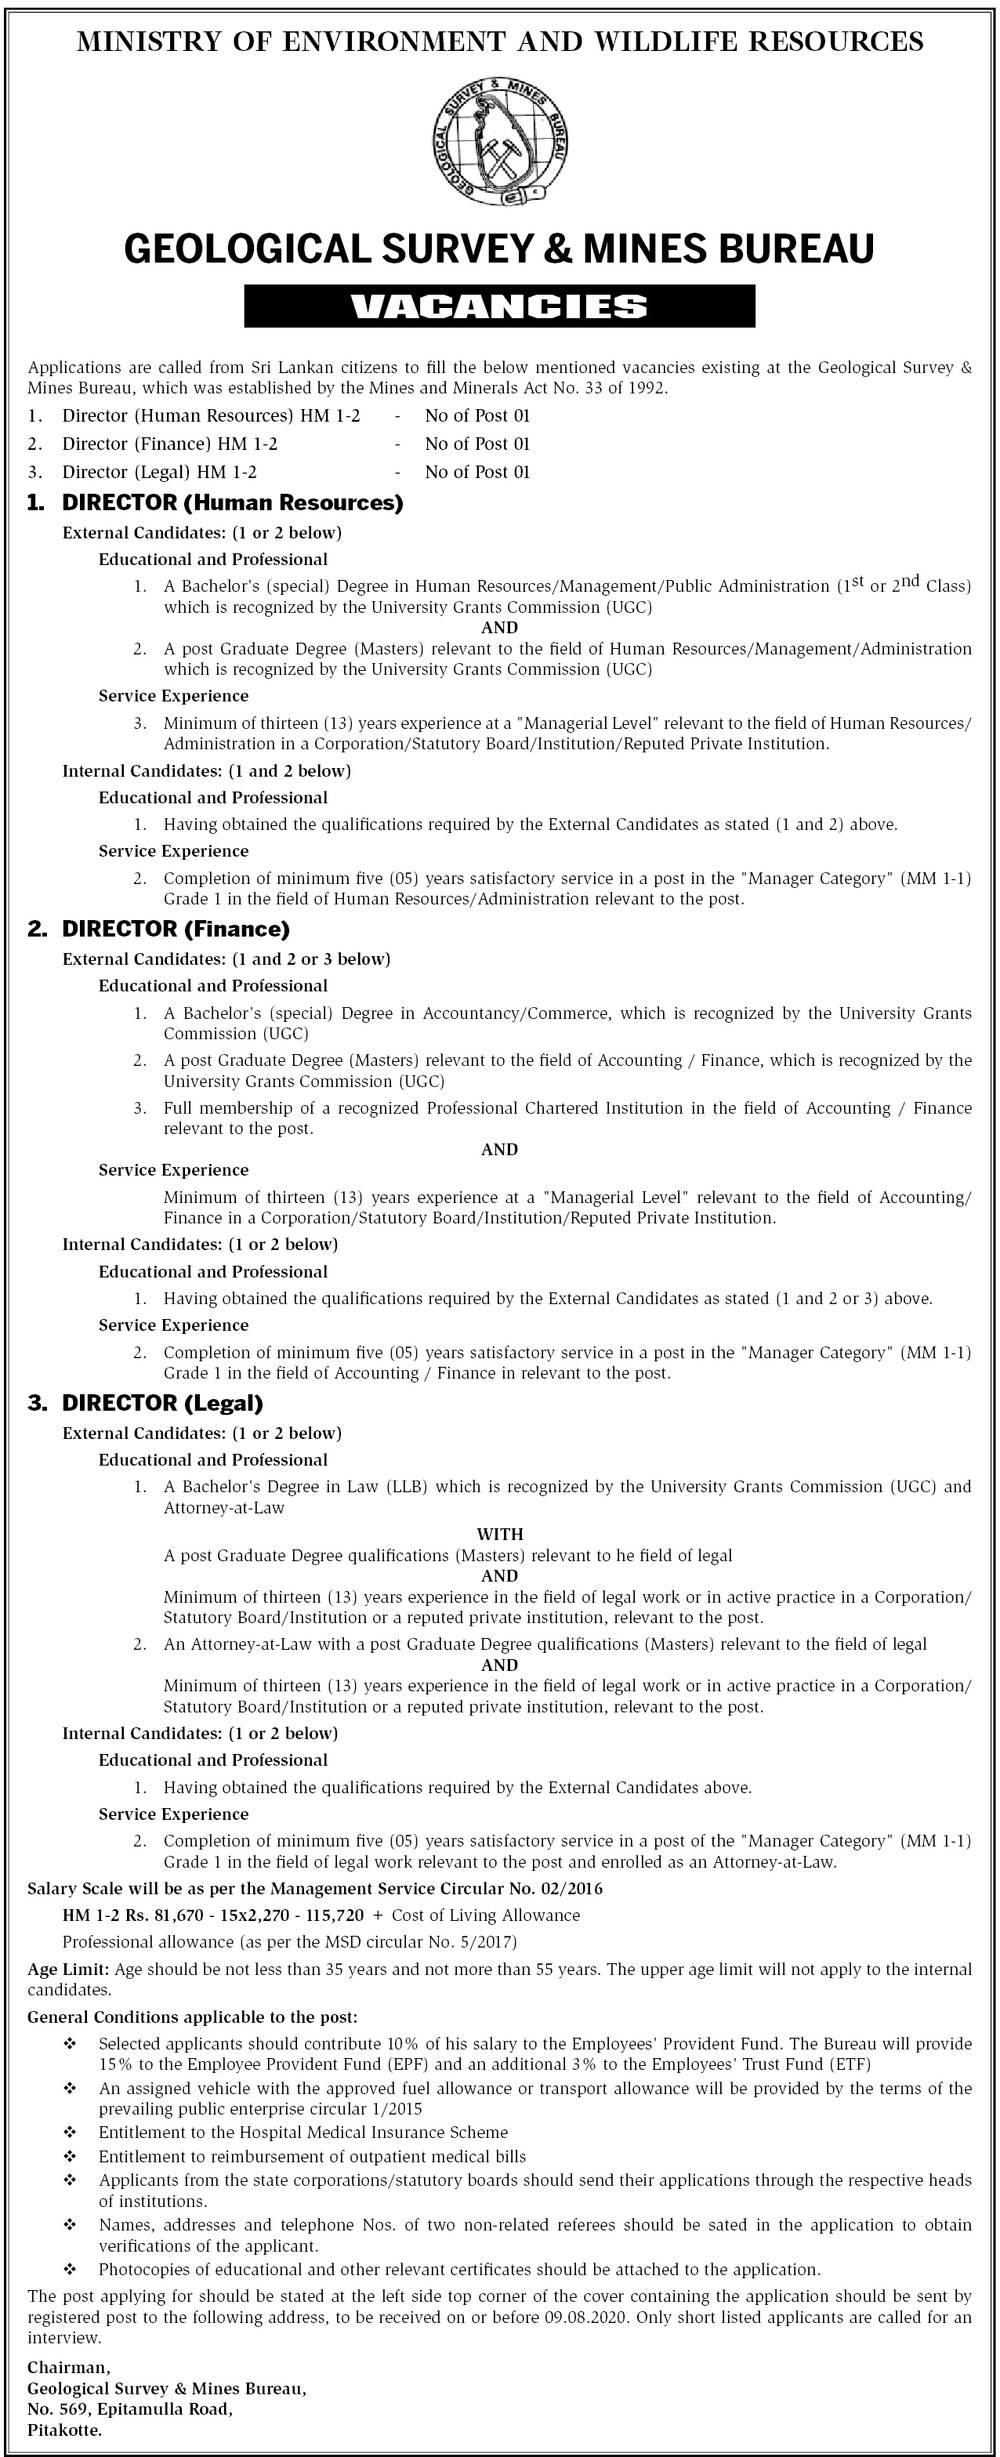 Director (HR, Finance, Legal) - Geological Survey & Mines Bureau